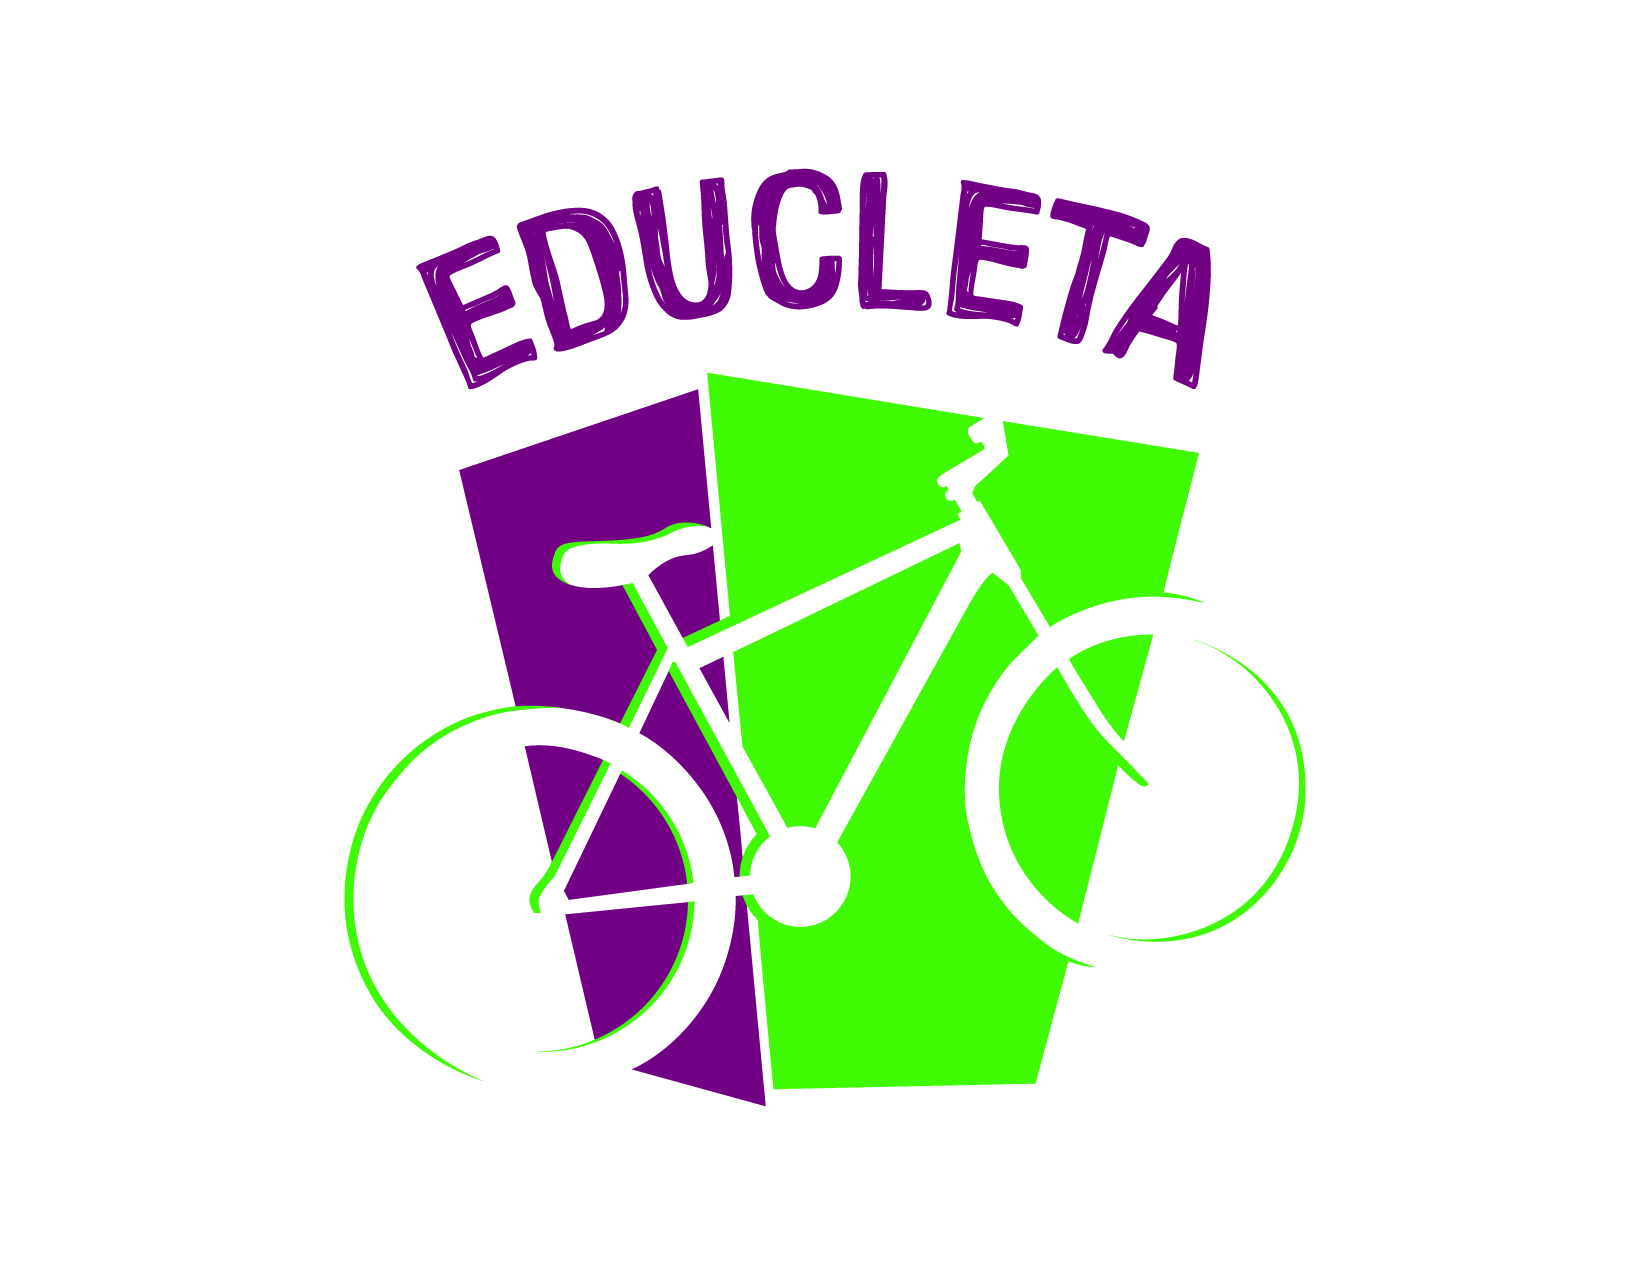 educleta